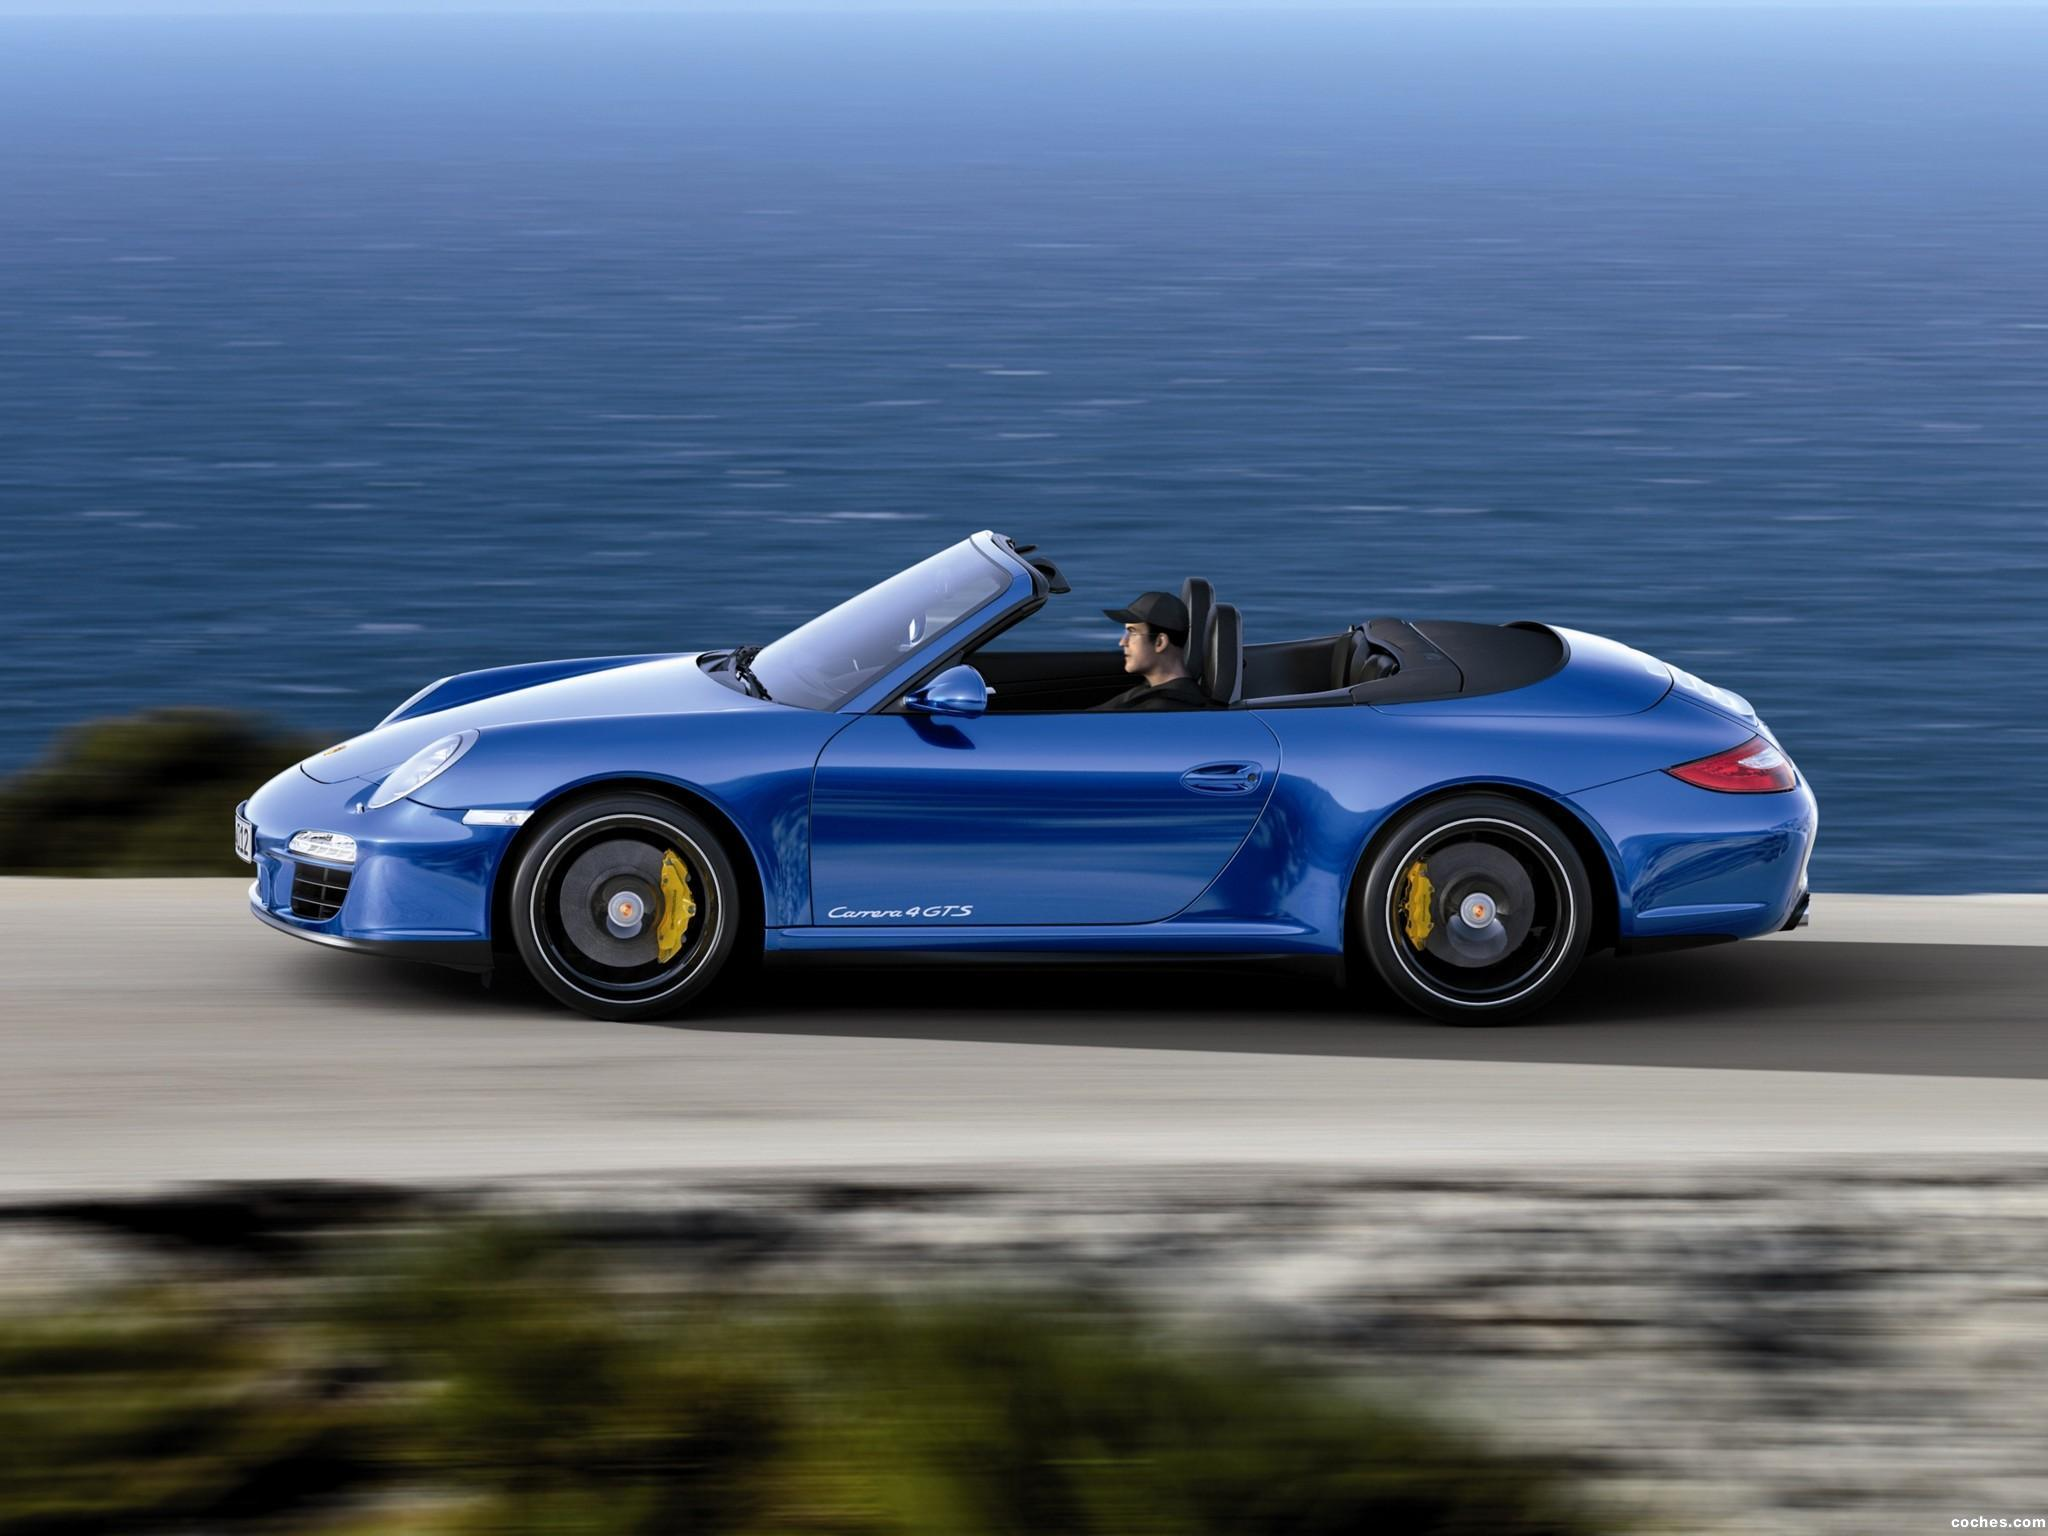 Foto 2 de Porsche 911 Carrera 4 GTS Cabriolet 997 2011